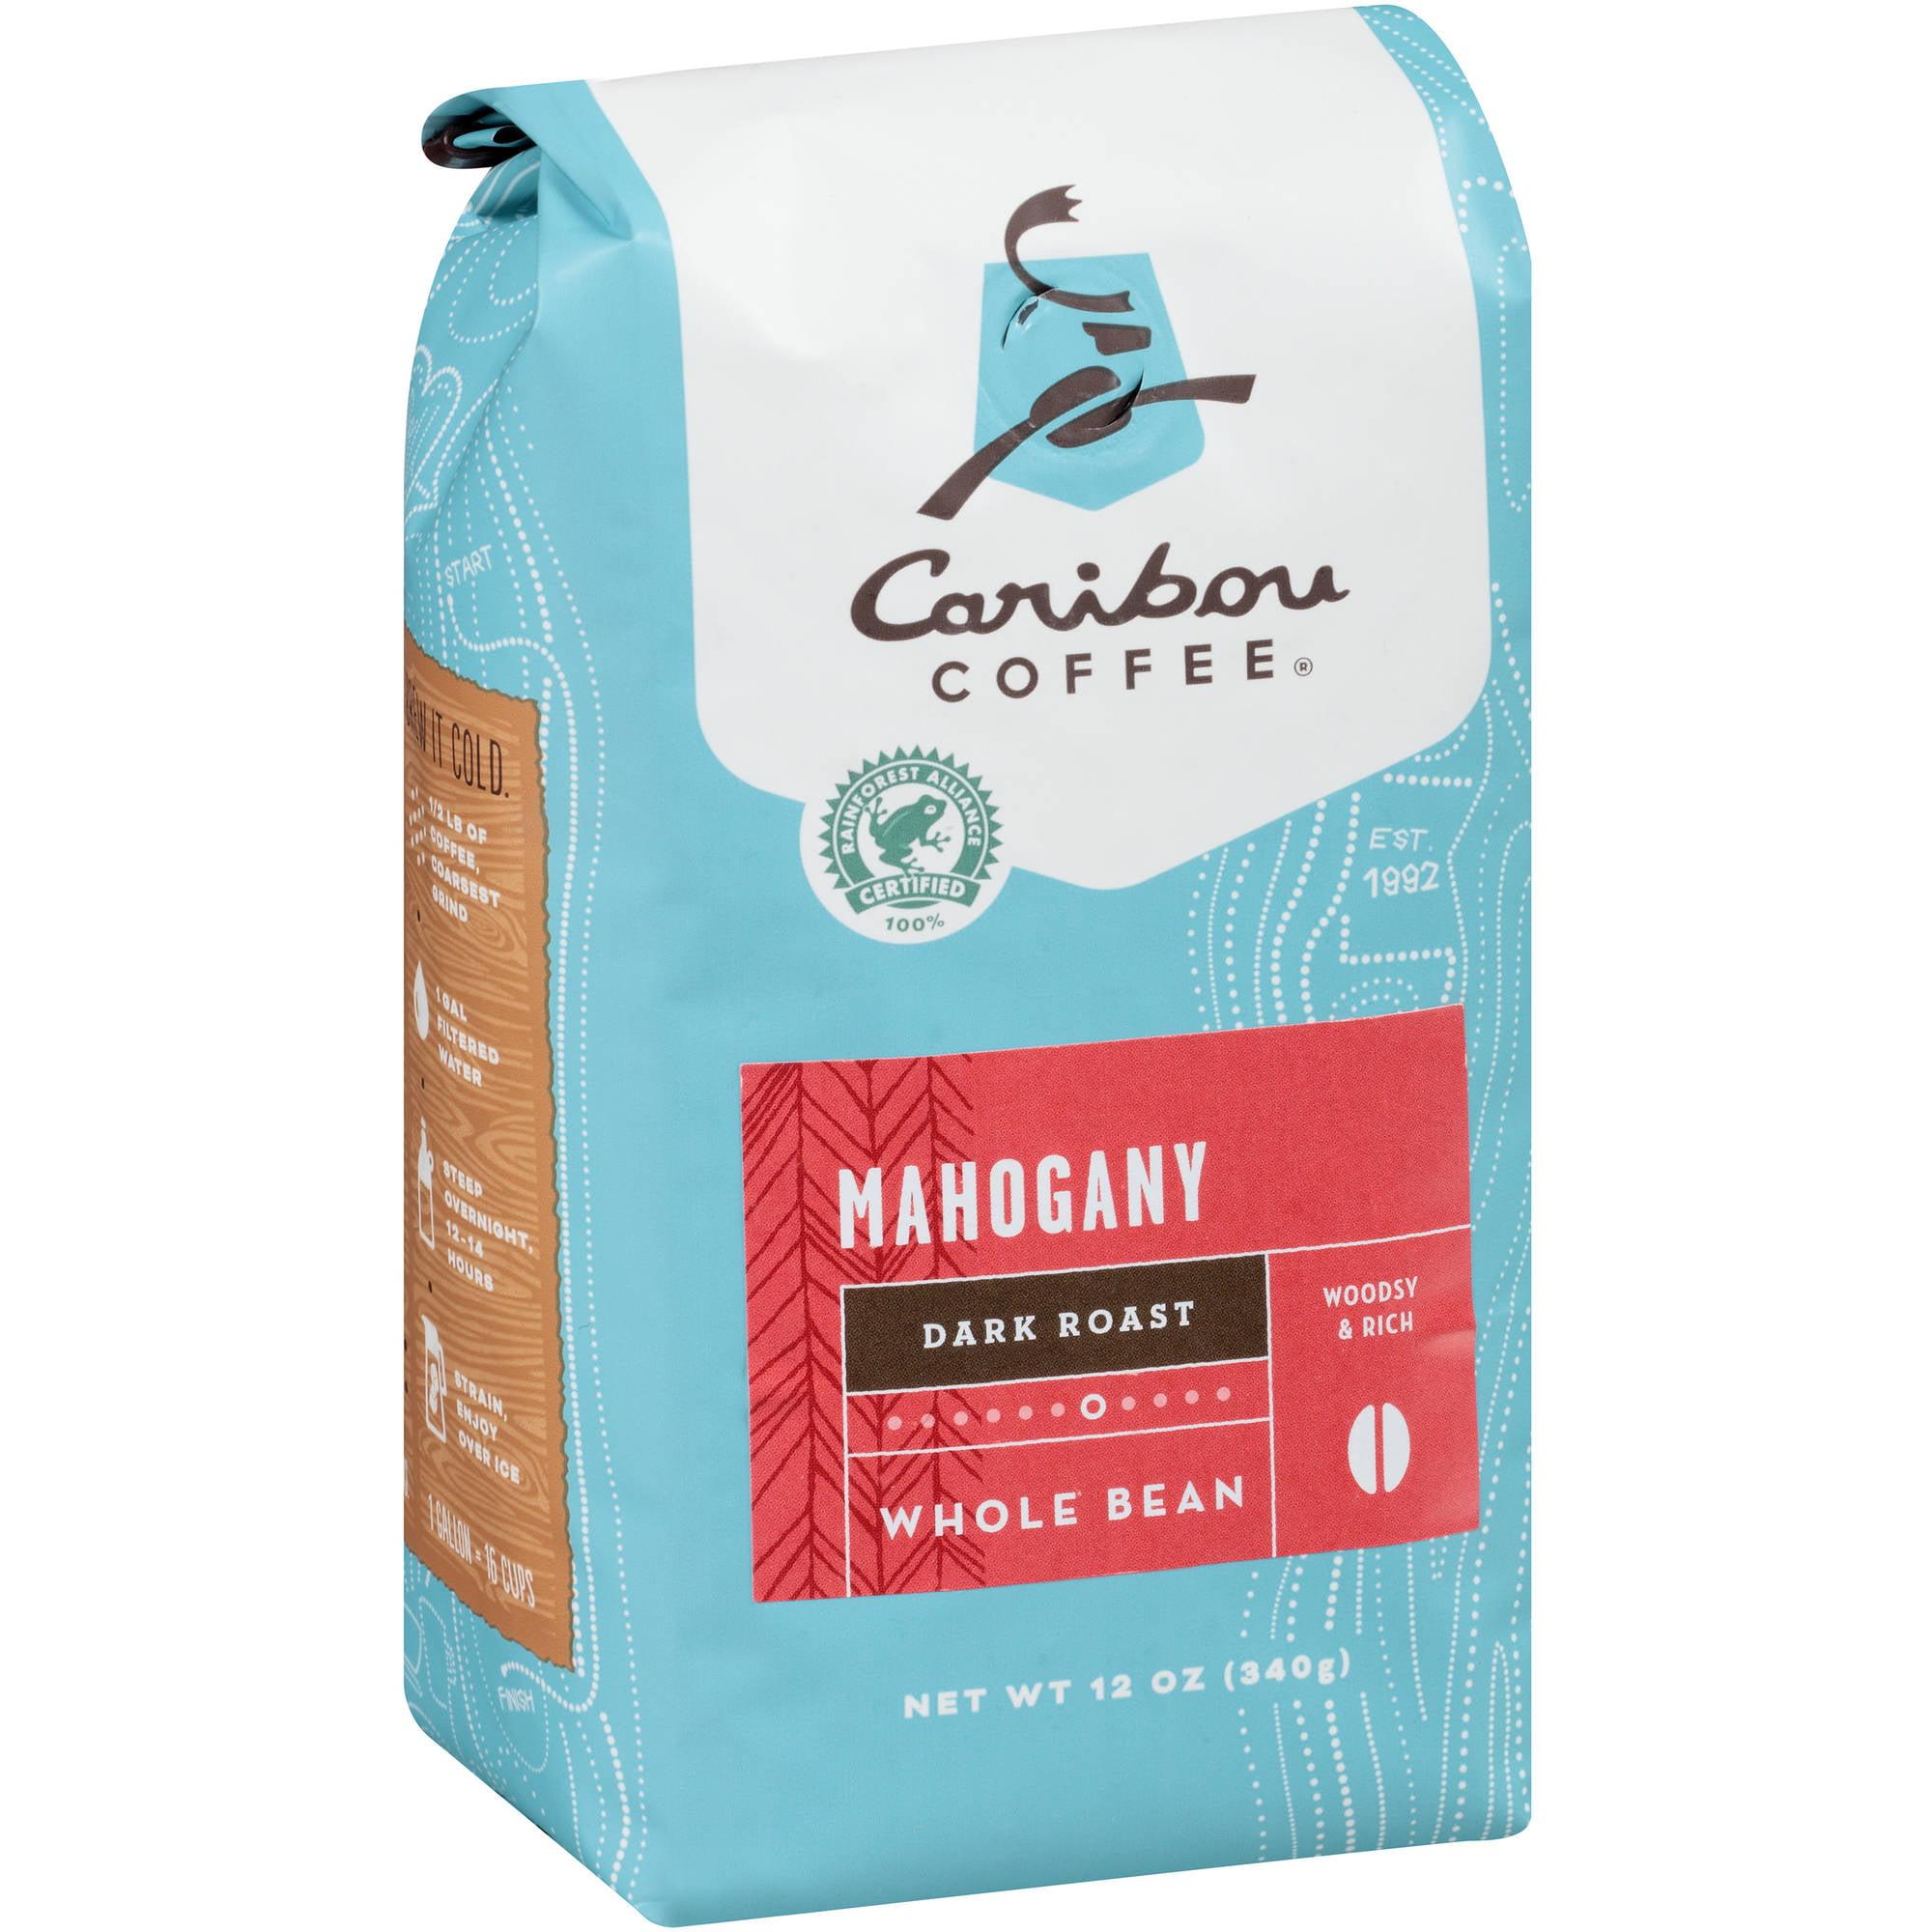 Caribou Coffee Mahogany Dark Roast Whole Bean Coffee, 12 oz